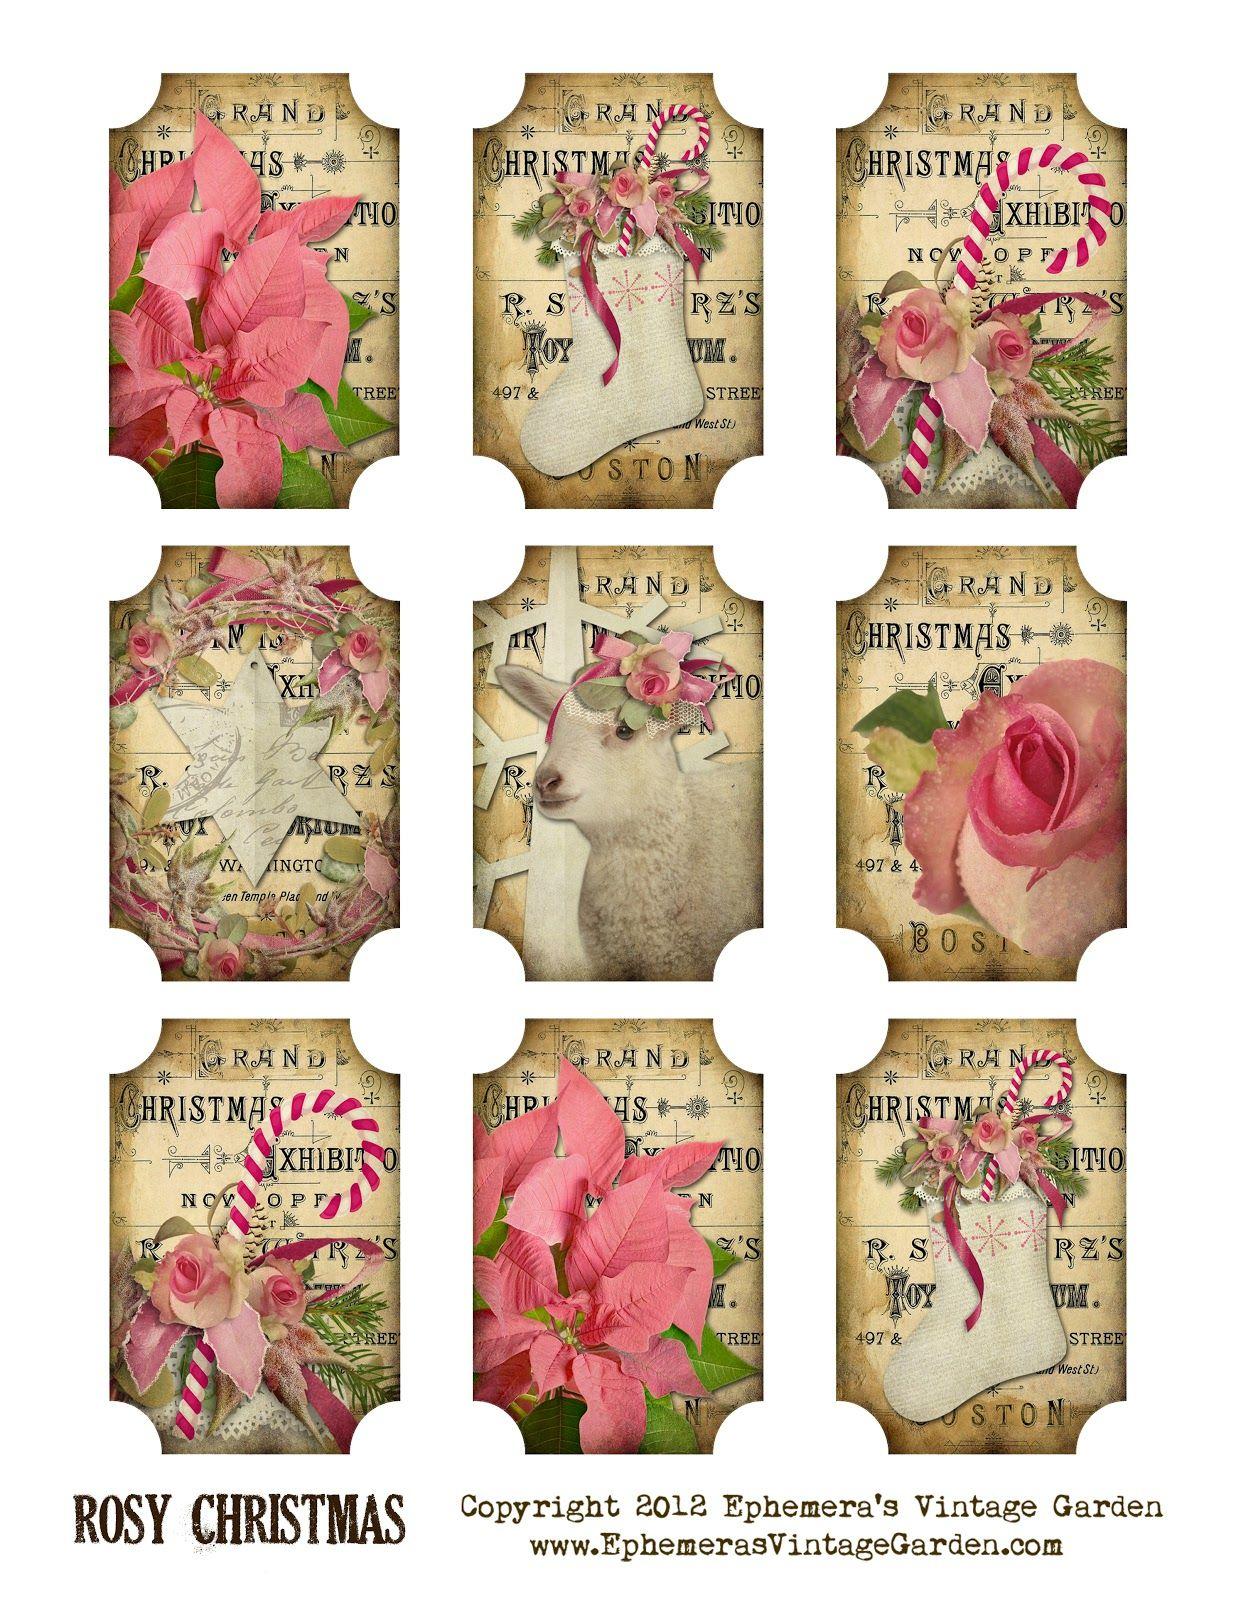 Ephemera's Vintage Garden: Free Printable: Rosy Christmas Gift Tags - Free Printable Vintage Christmas Tags For Gifts